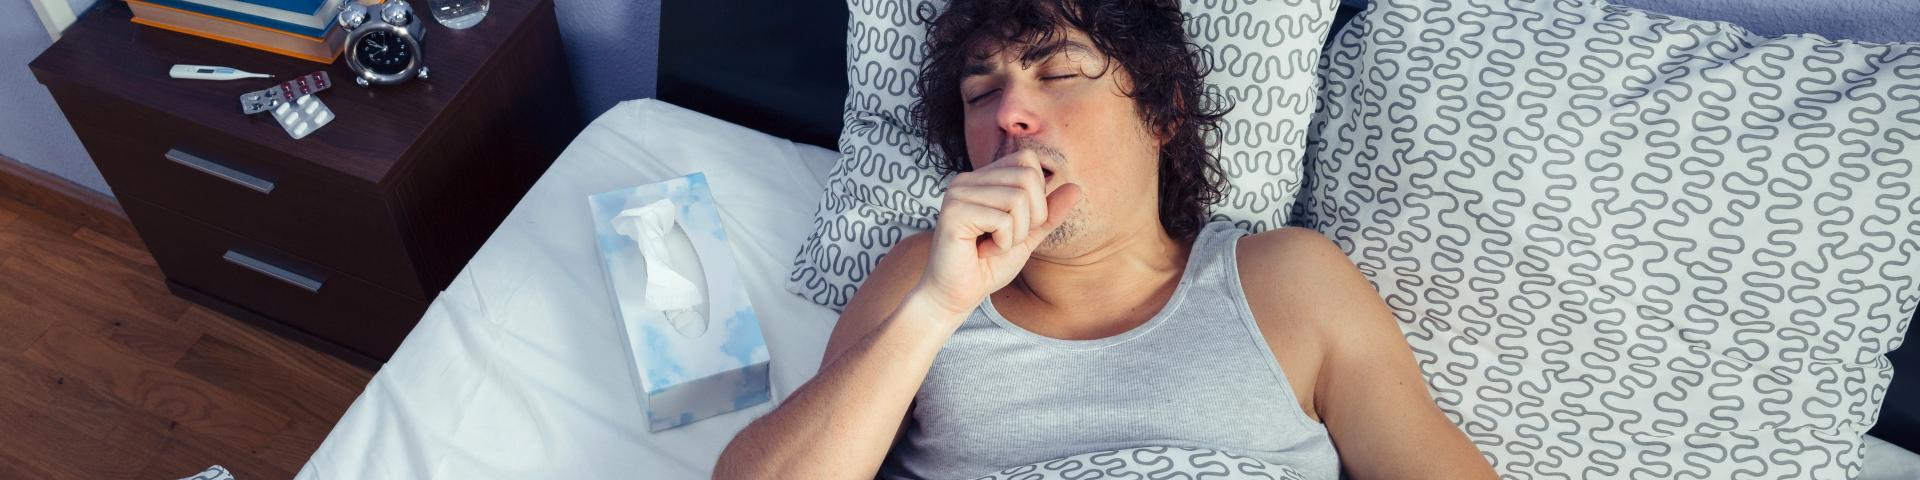 fogyjon, ha influenza van